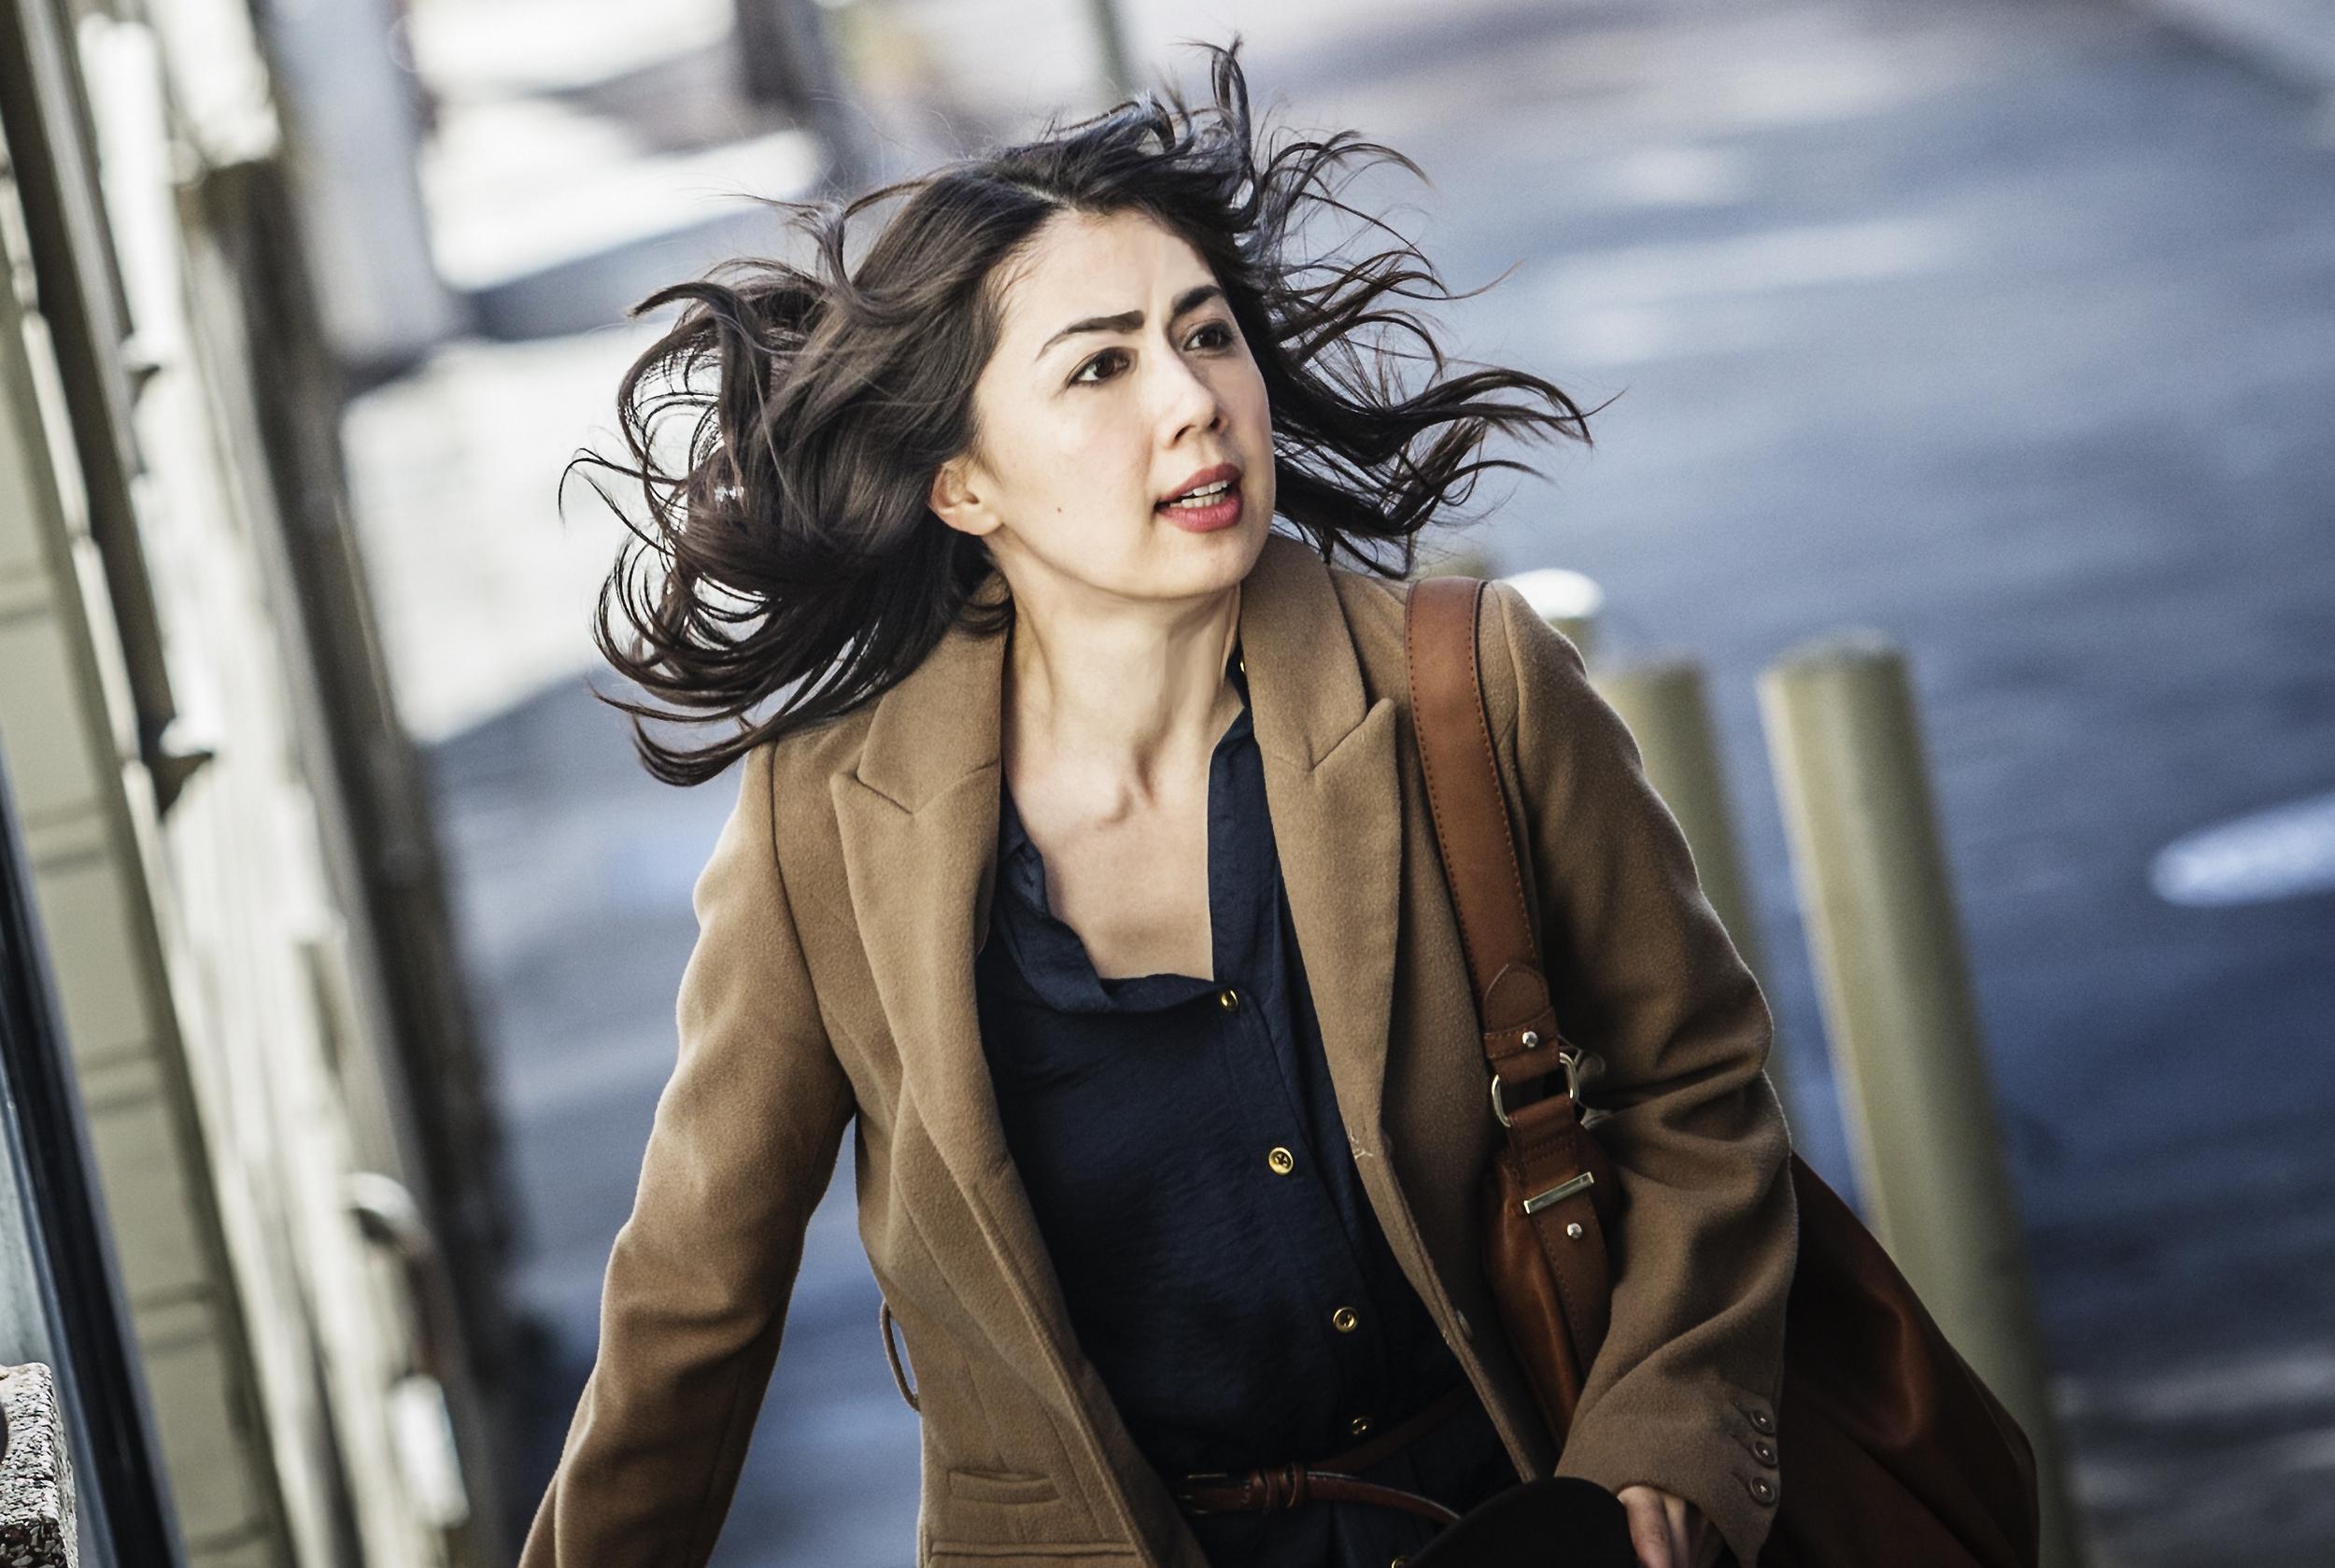 Ayako Fujitani stars in Man From Reno